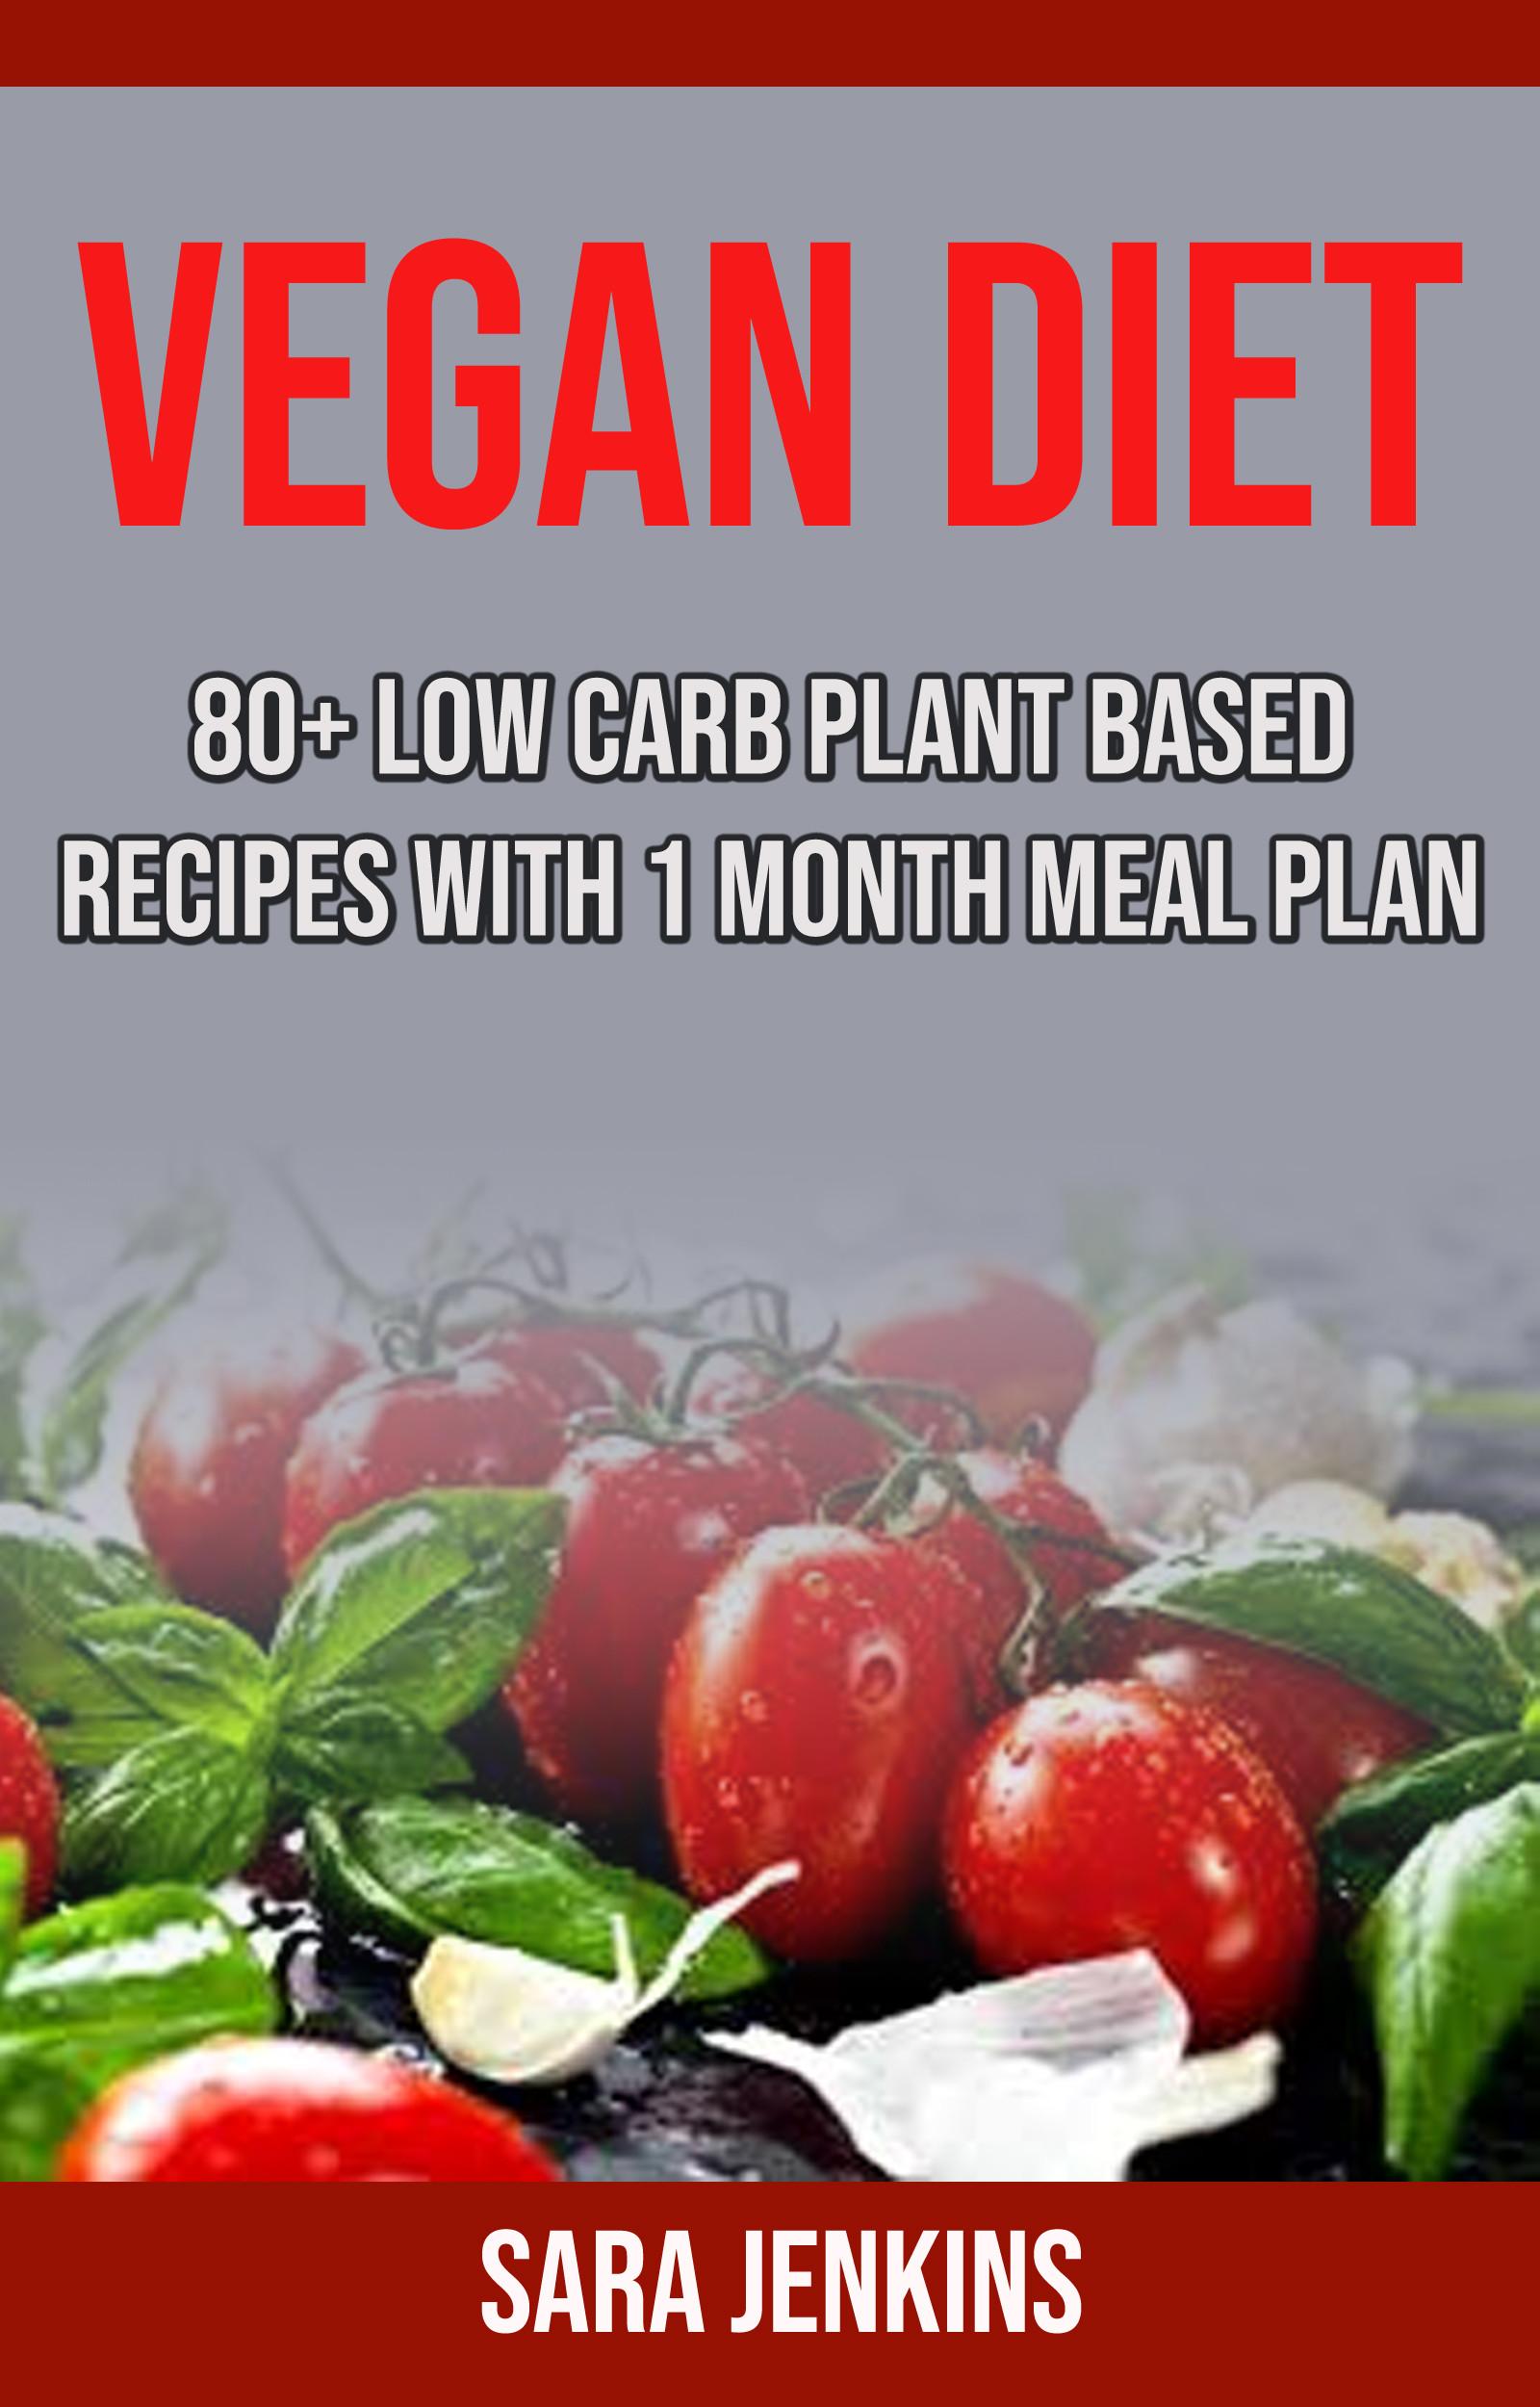 Low Carb Plant Based Diet  Babelcube – Vegan t 80 low carb plant based recipes